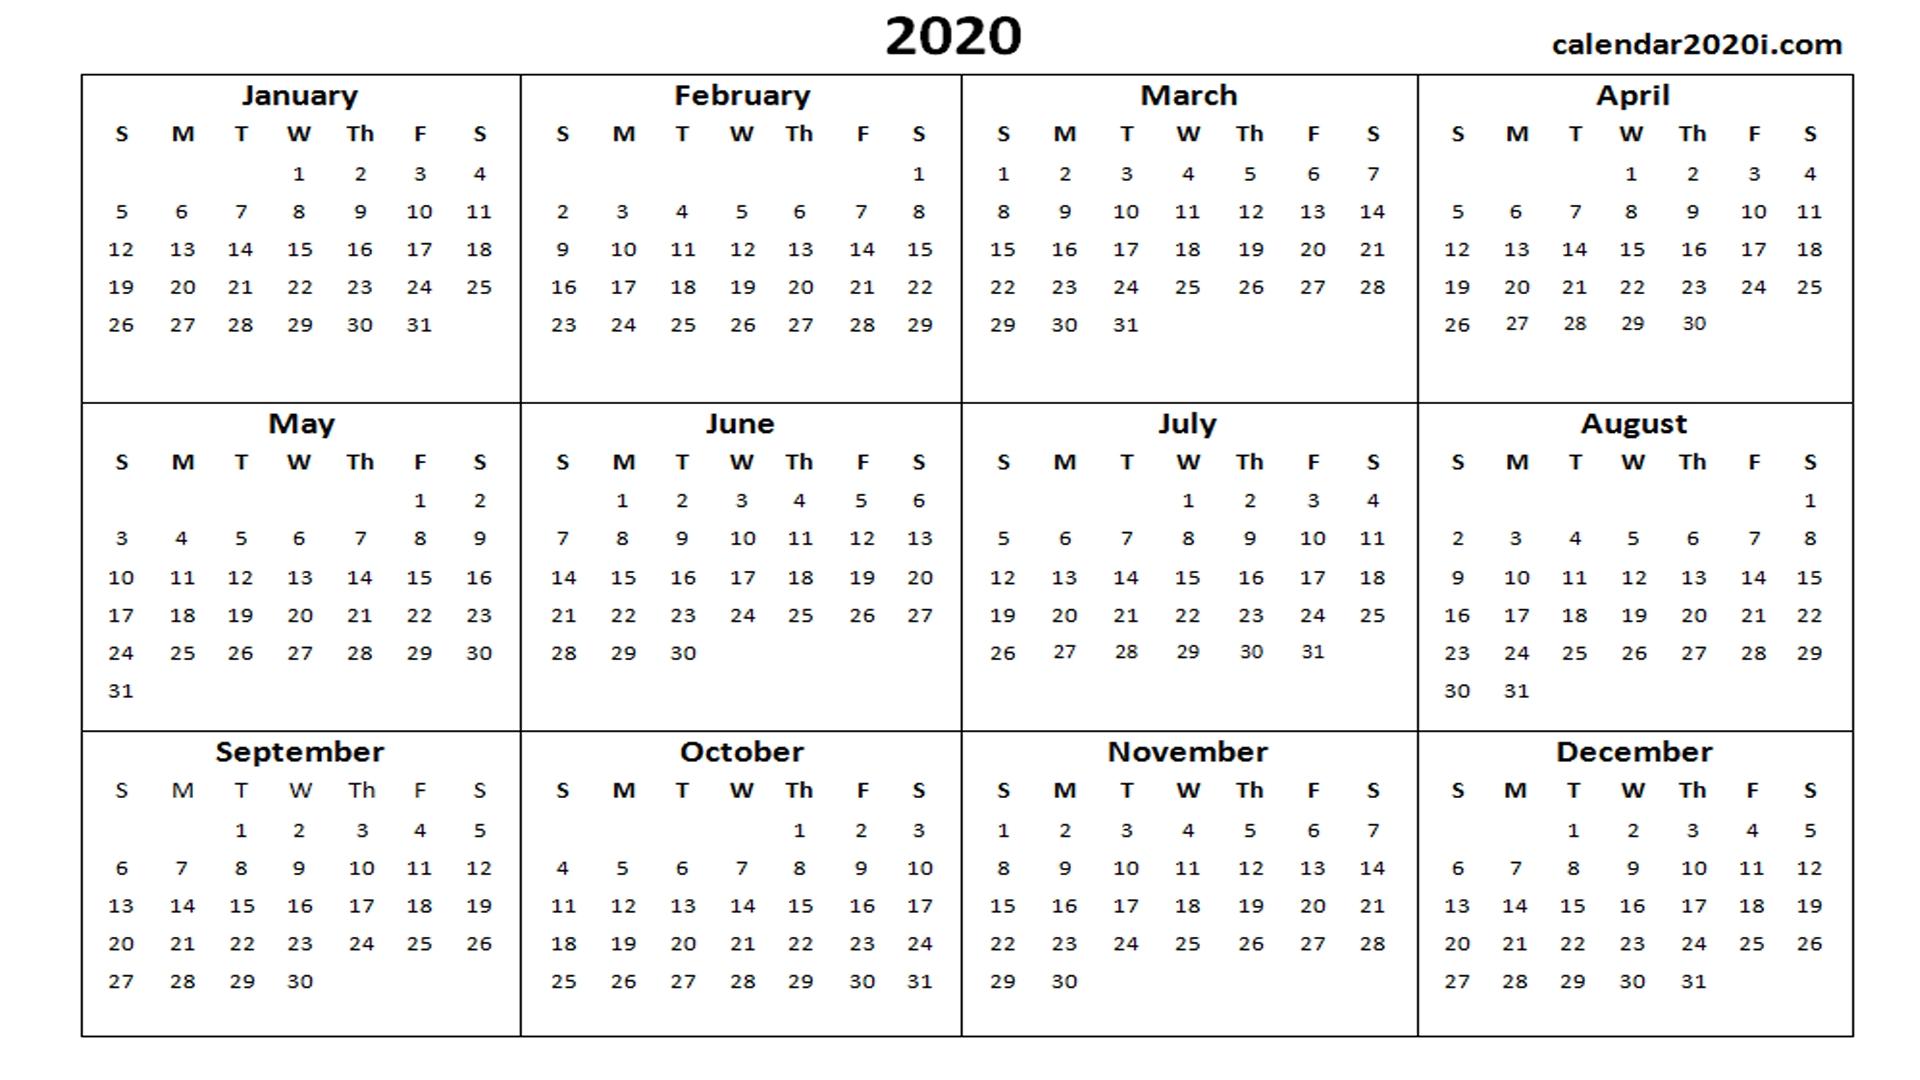 2020 Calendar Printable Template Holidays, Word, Excel, Pdf-Blank Calendar 2020 Printable Uk